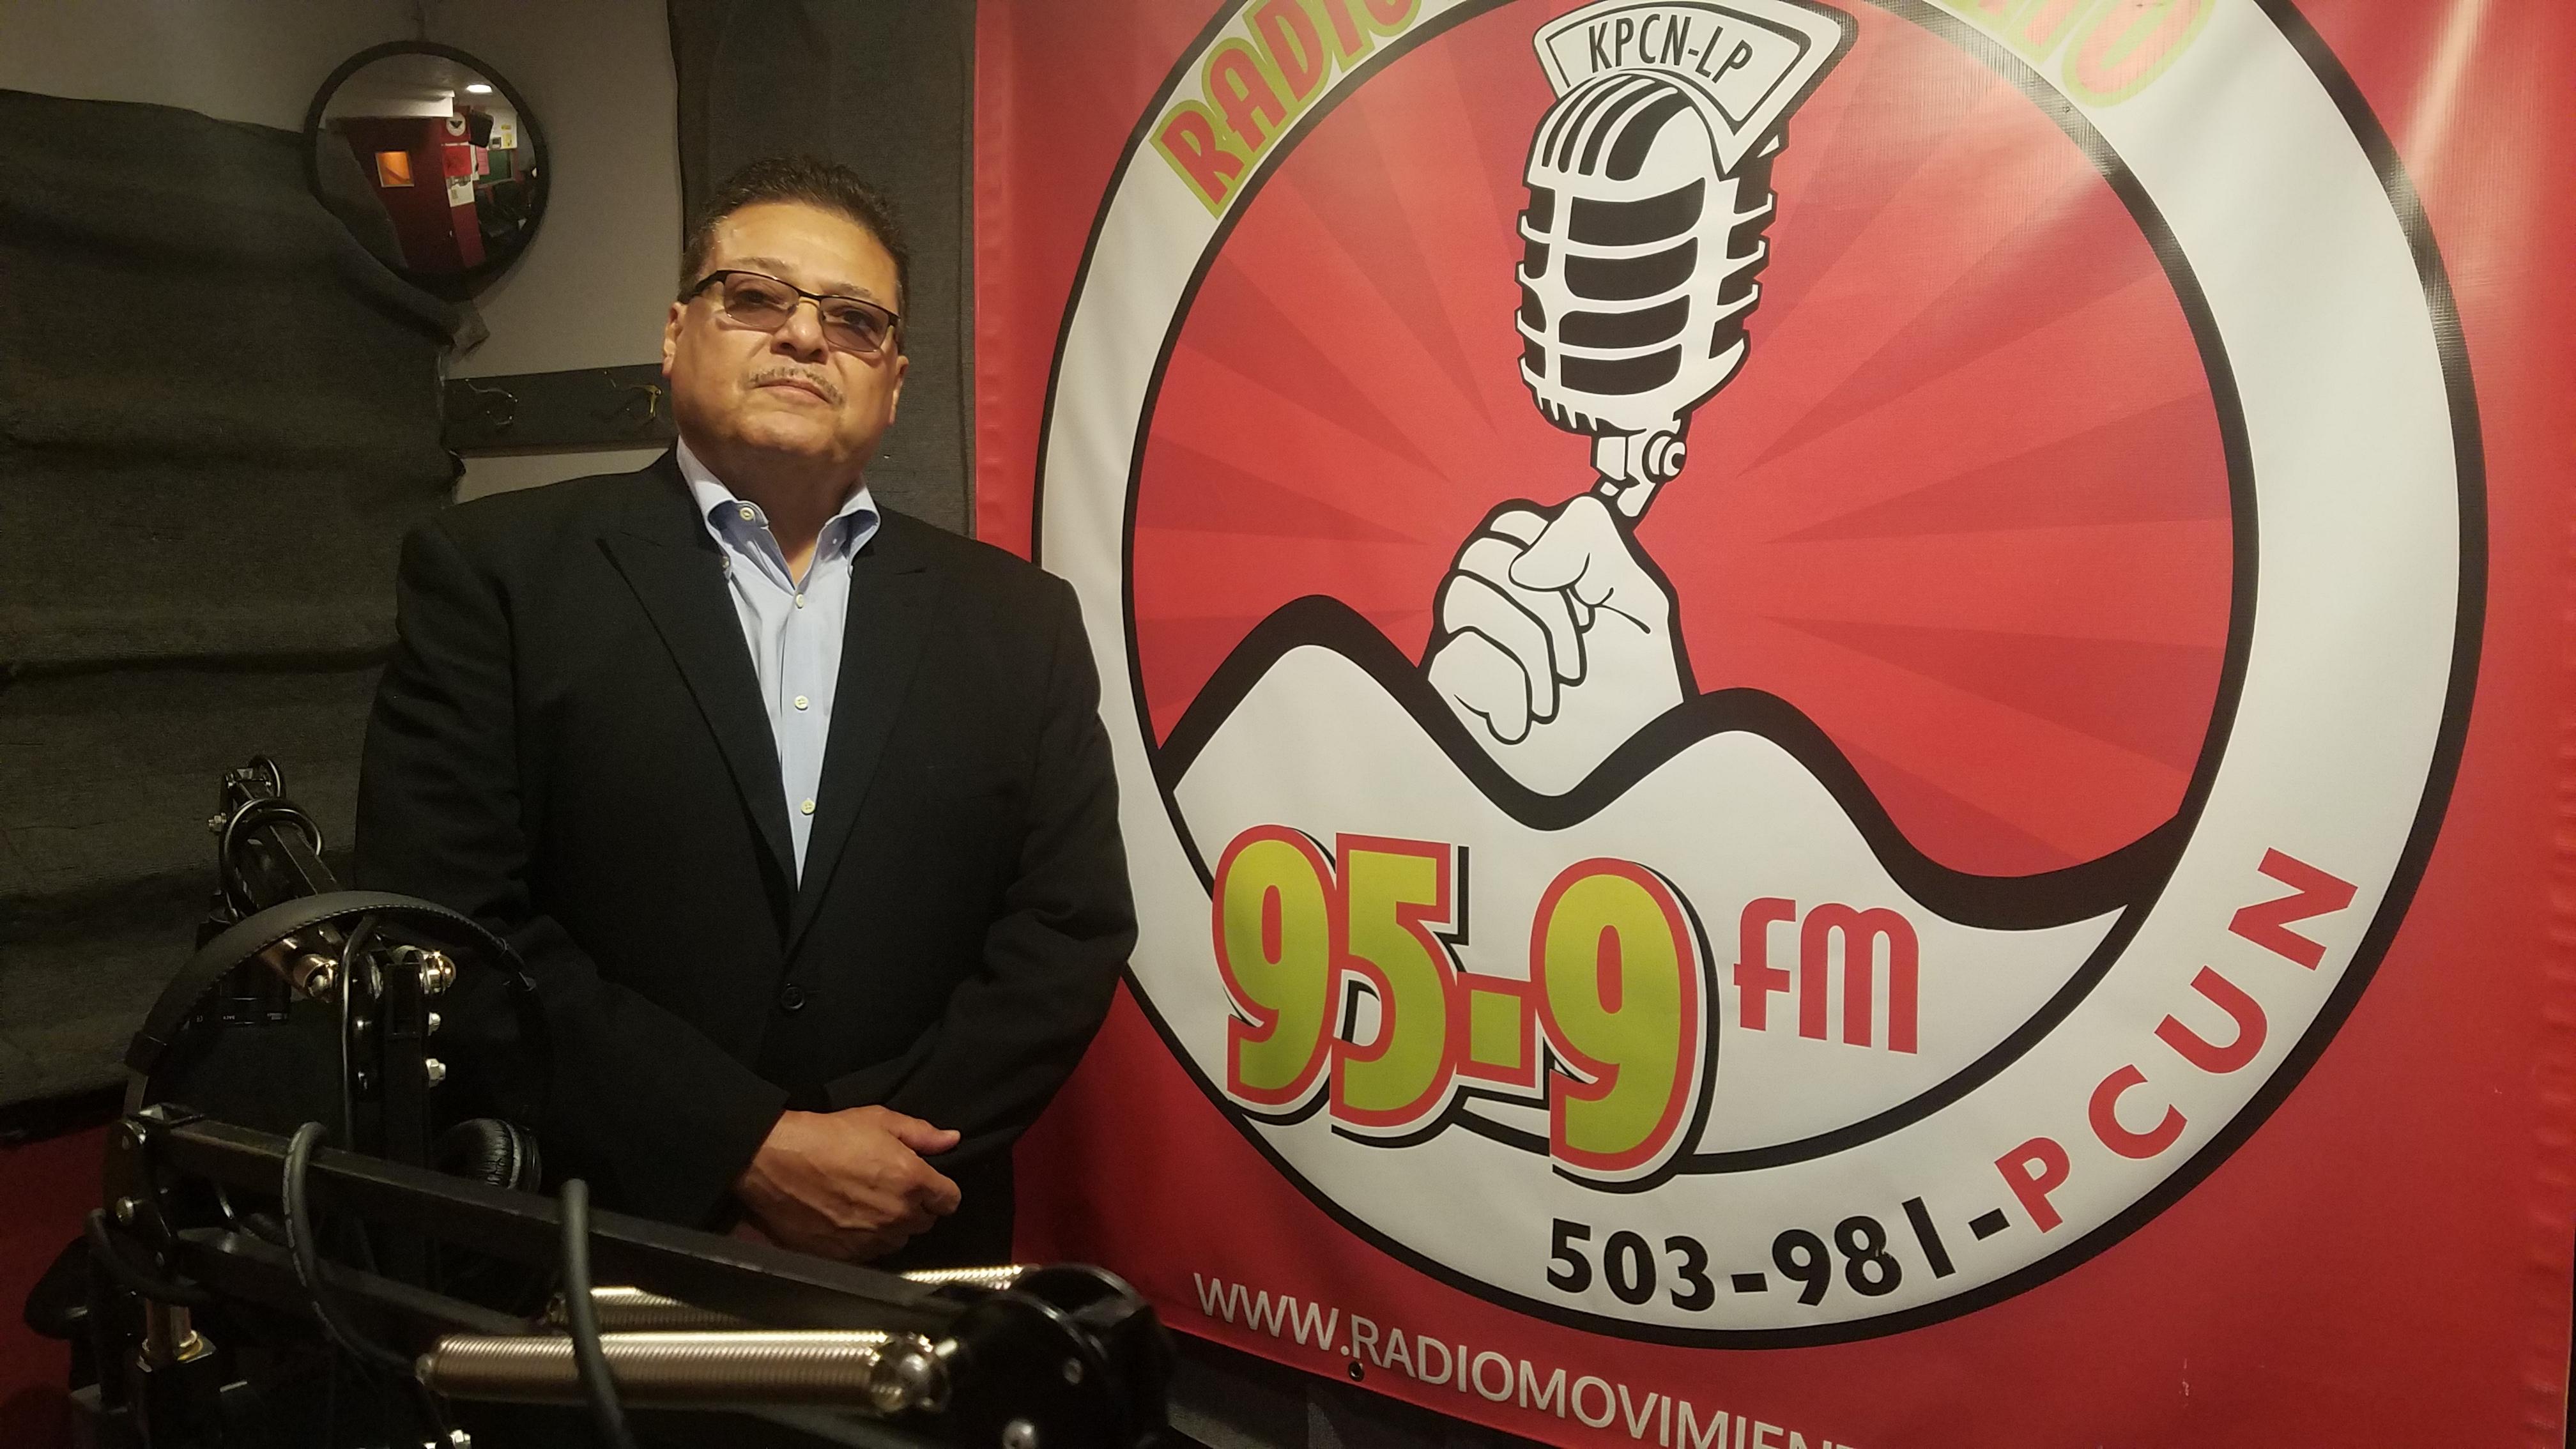 Ramón Ramírez of PCUN